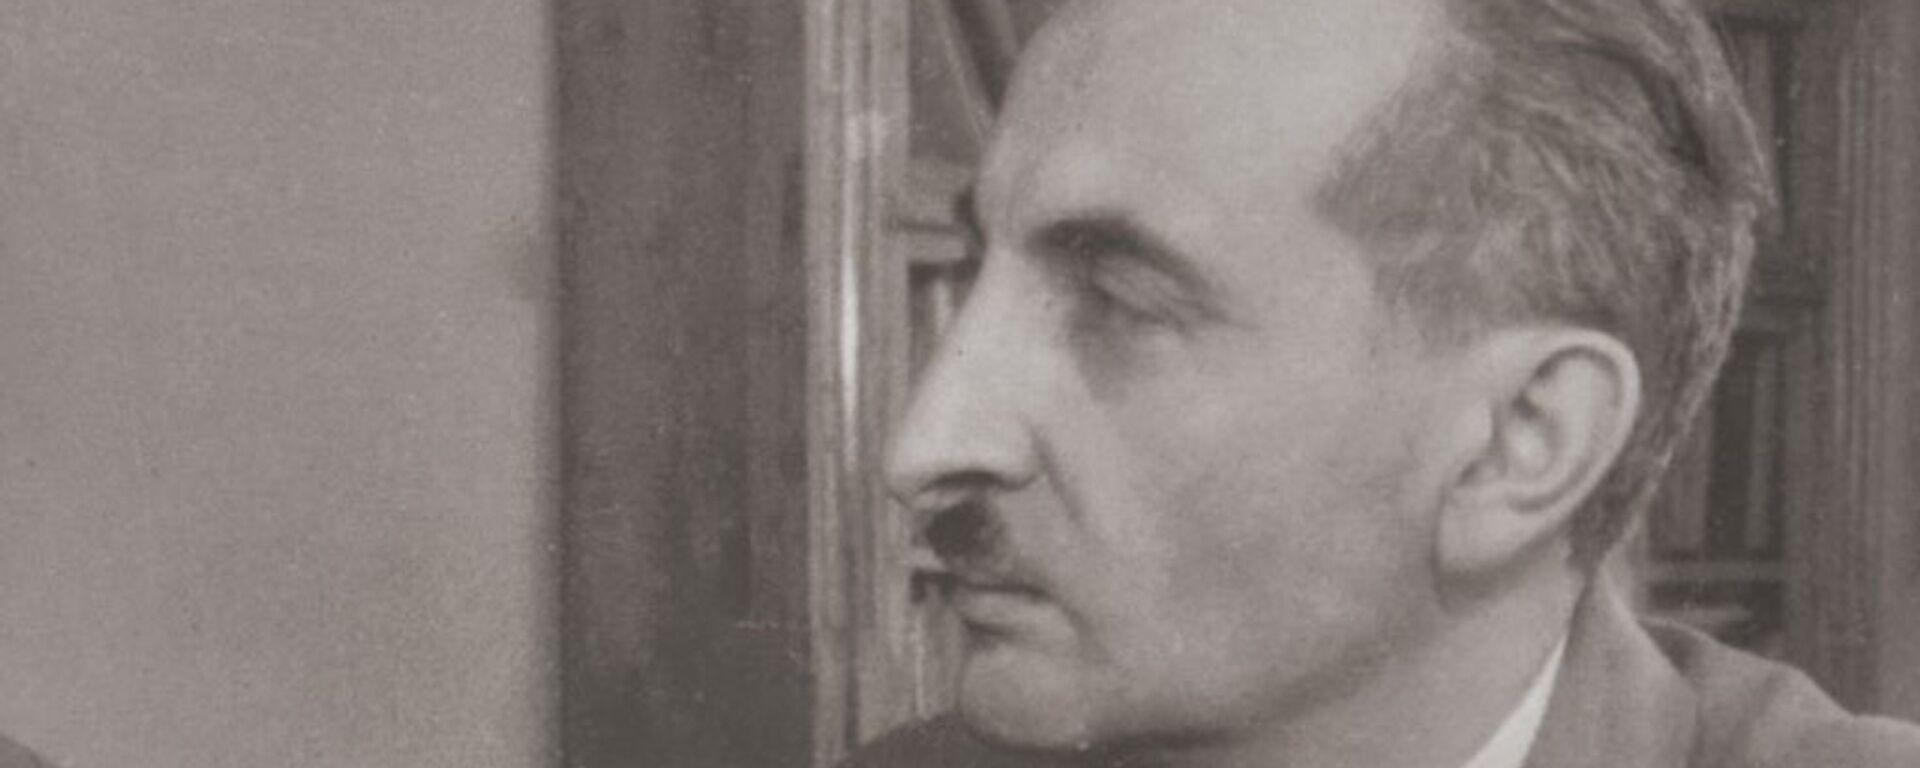 Аԥсны Жәлар рпоет Баграт Шьынқәба - Sputnik Аҧсны, 1920, 12.05.2021